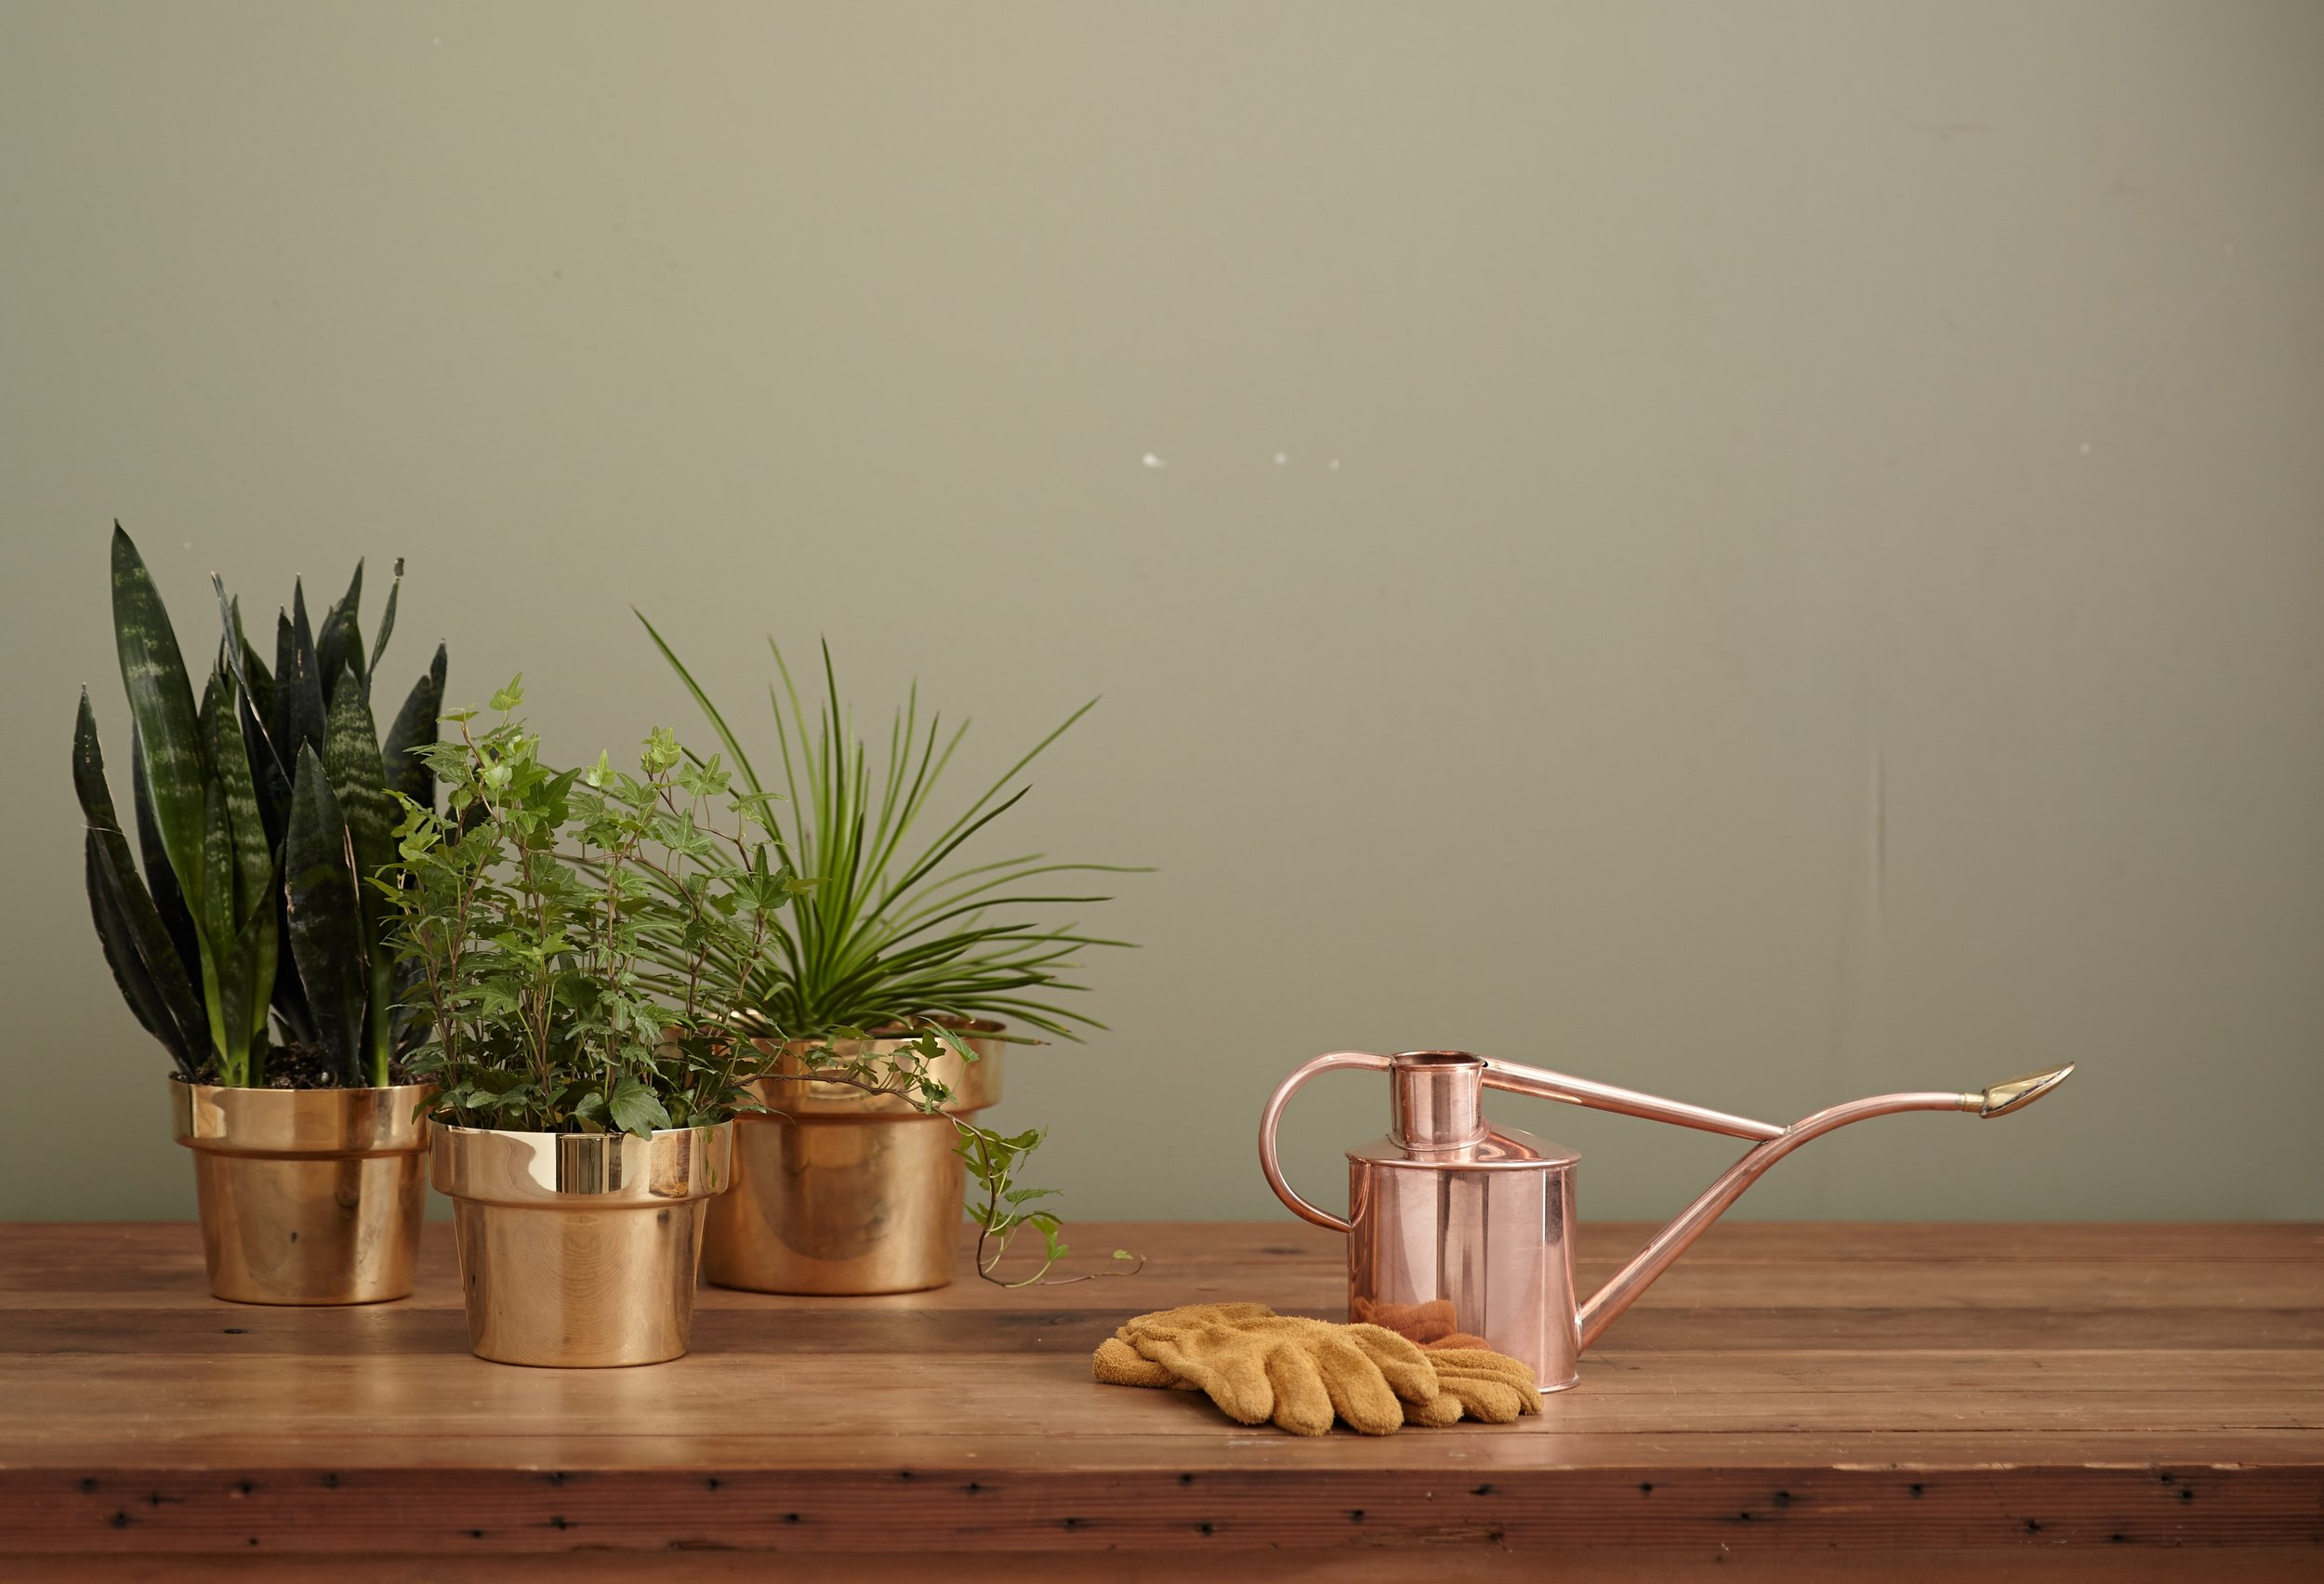 table-grass-plant-wood-flower-still-life-1410569-pxhere.com.jpg